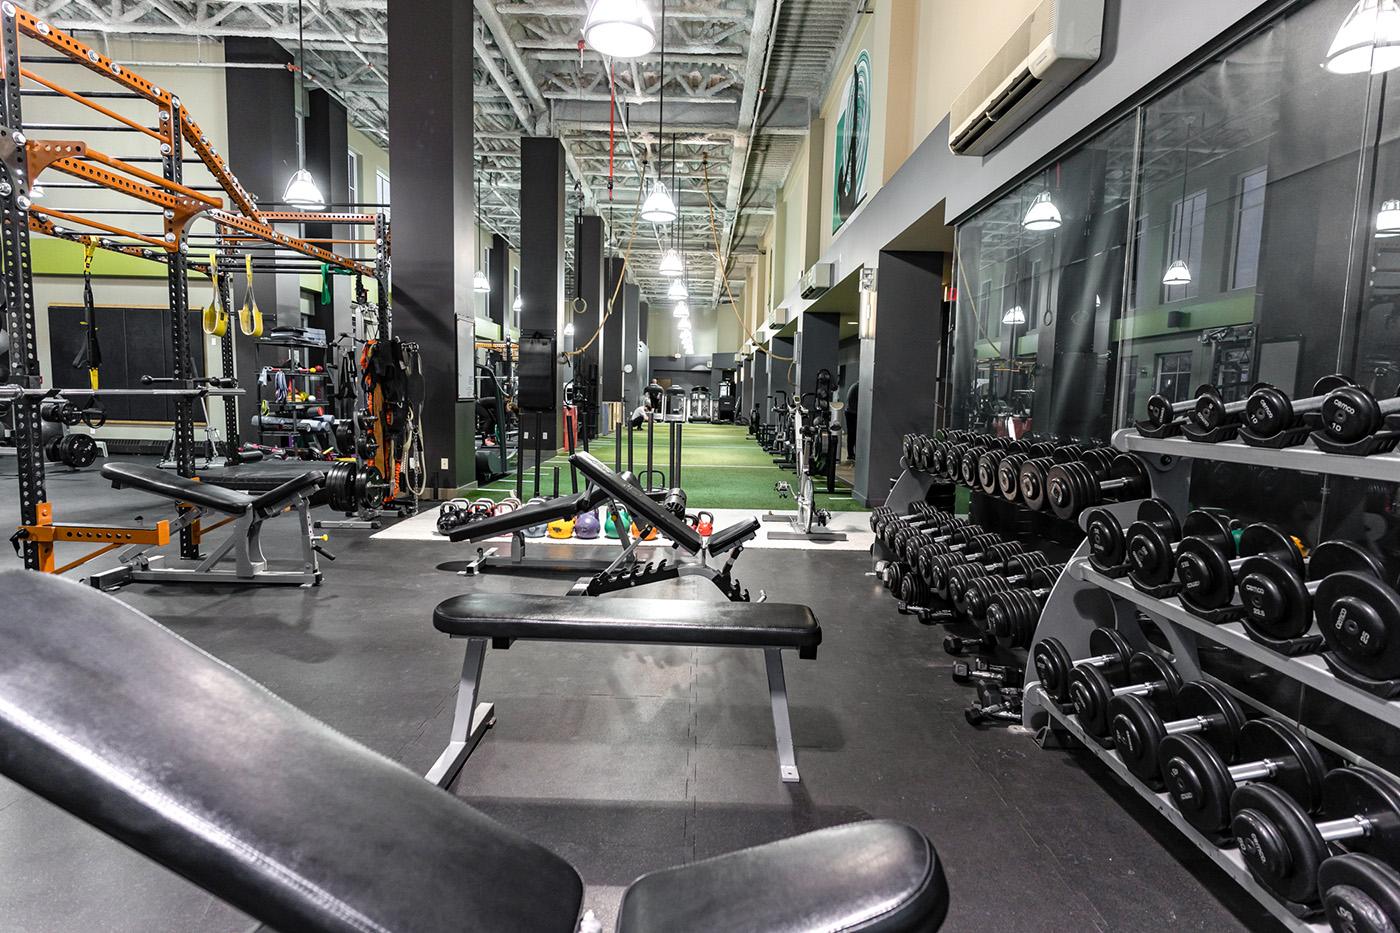 cityfit-gym-personal-training-calgary-workout-facility-inglewood-8.jpg